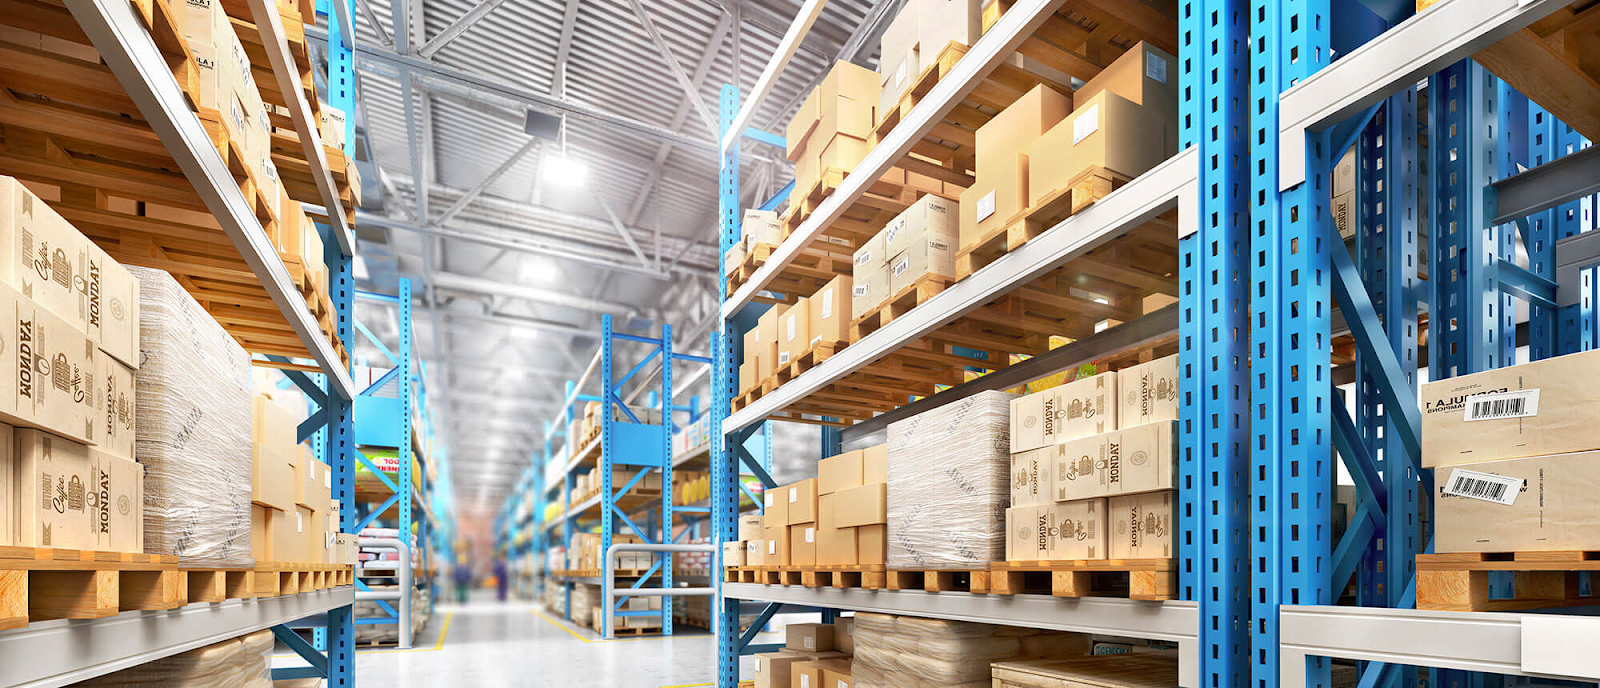 Order fulfillment warehouse